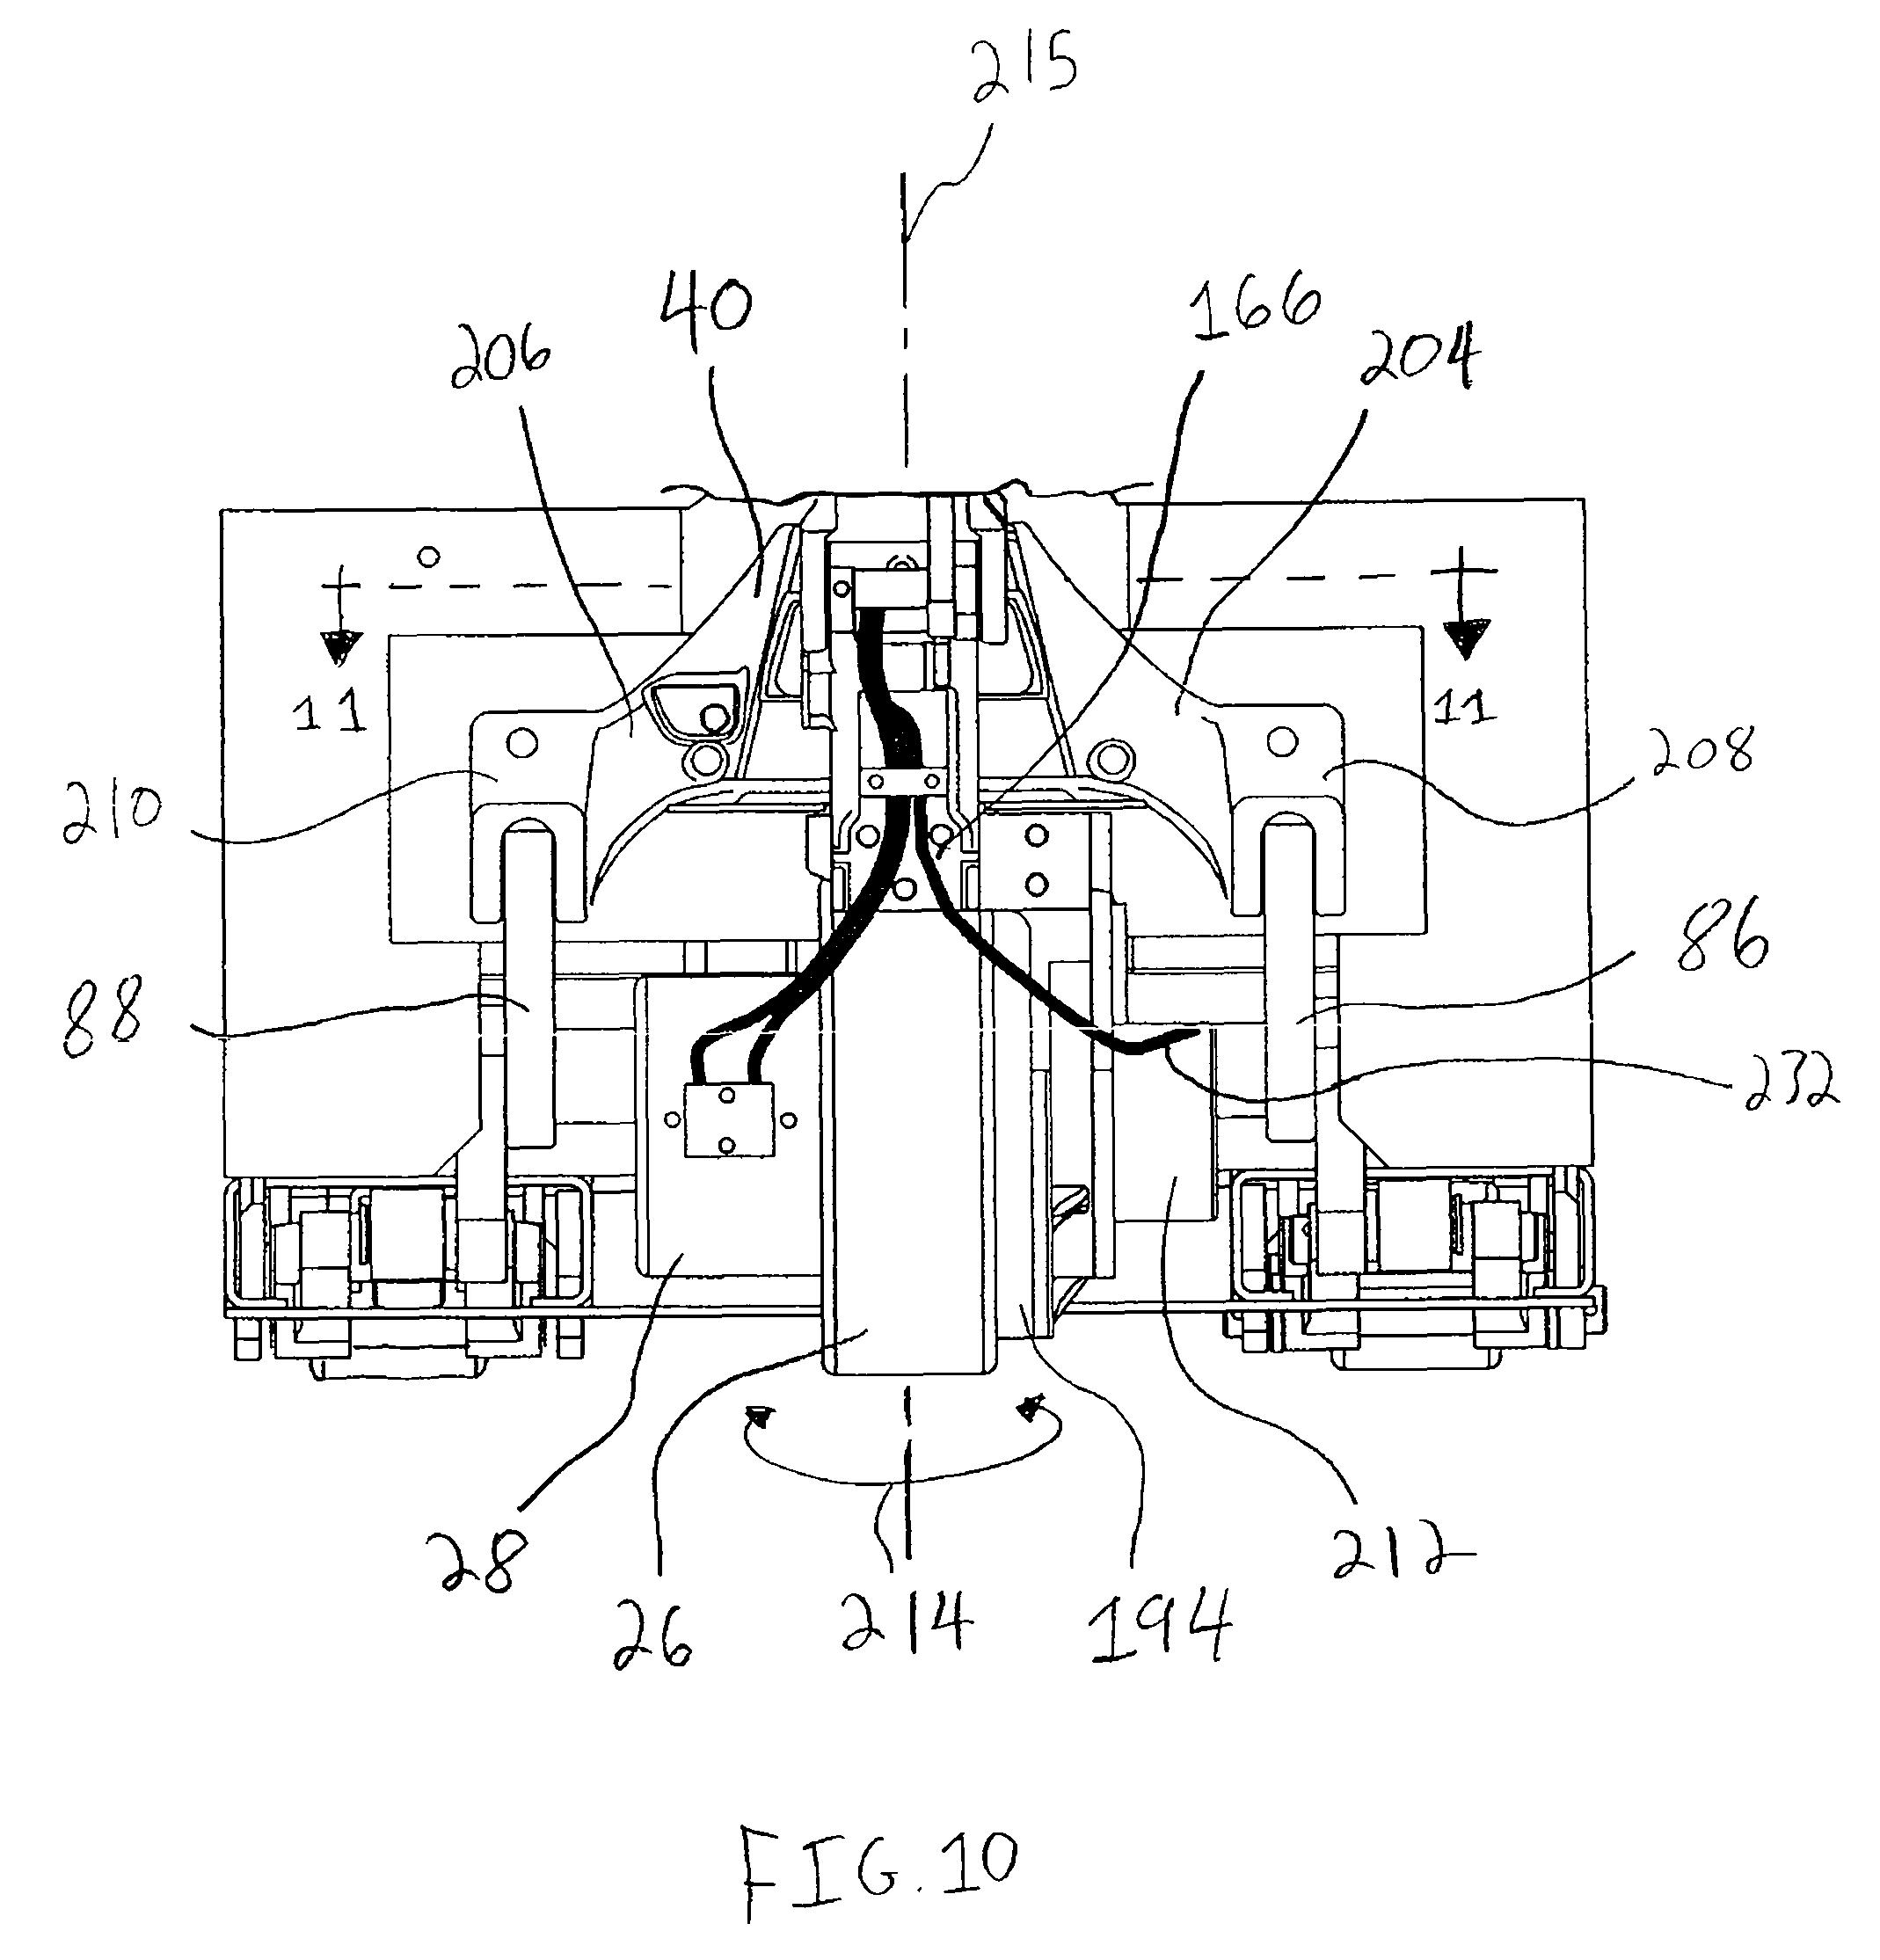 Battery Wire Diagram For Mpb040 Mpb040 En24t Lift